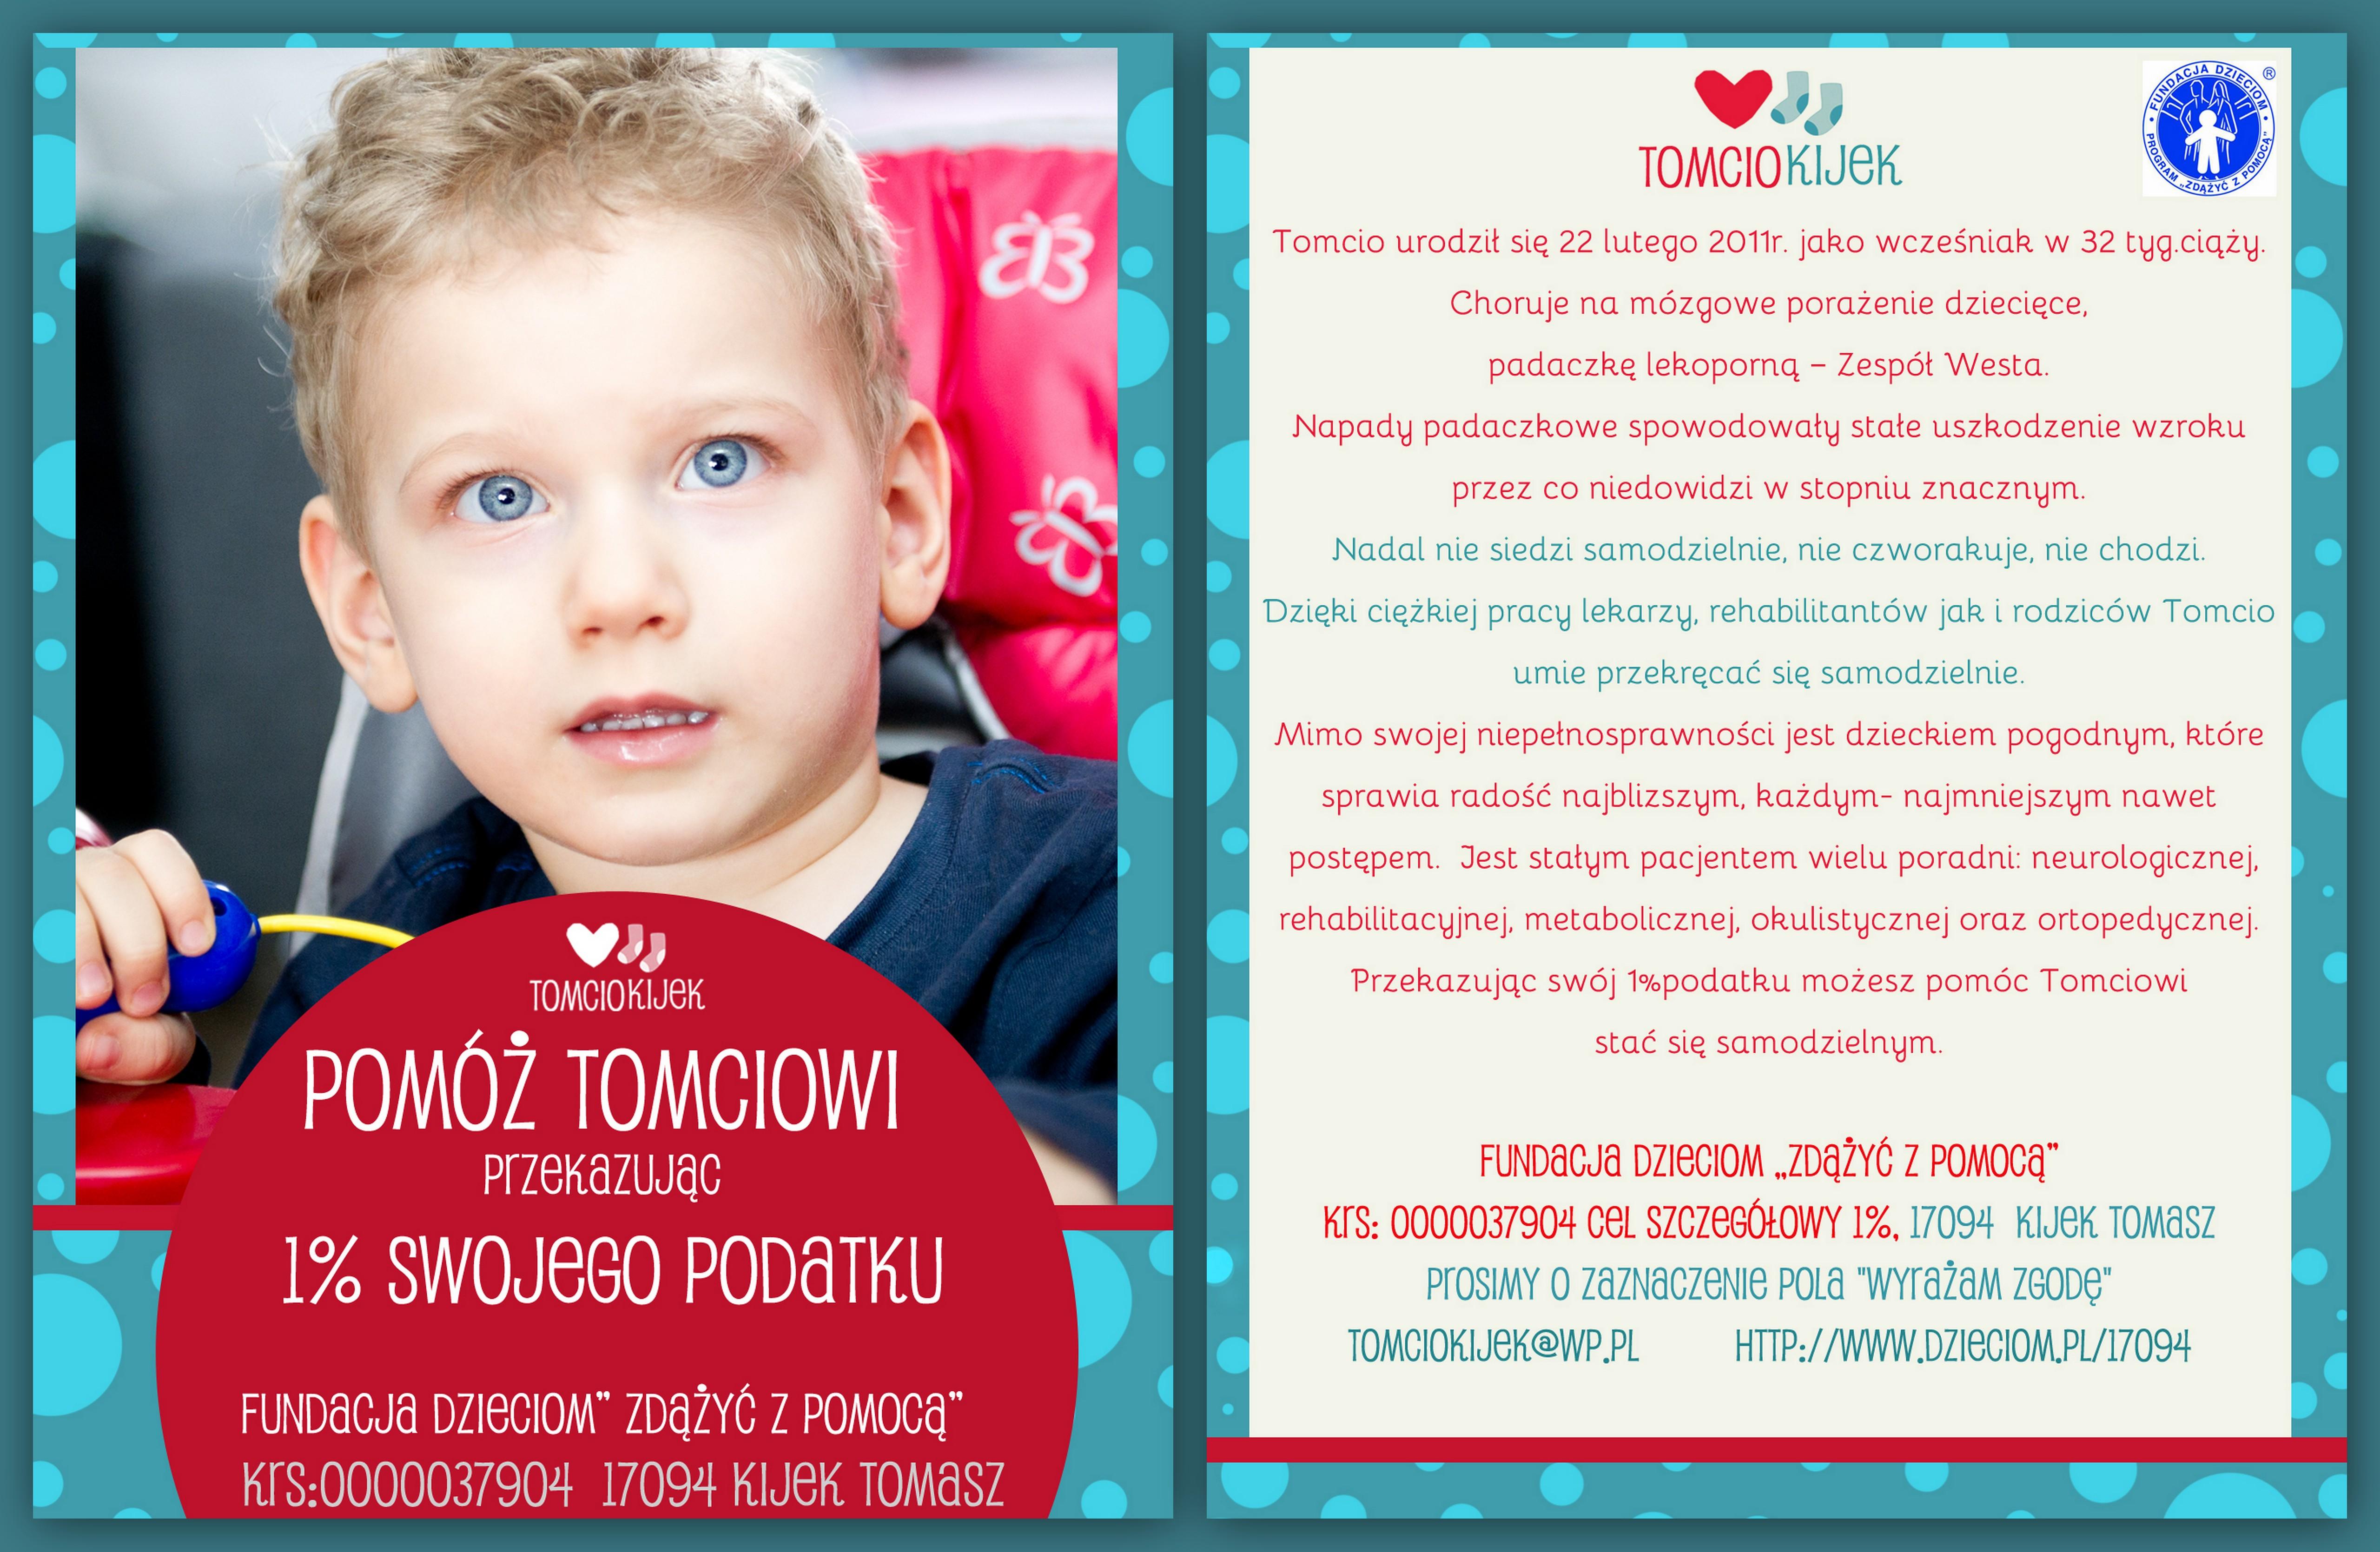 Tomek Kijek_2014